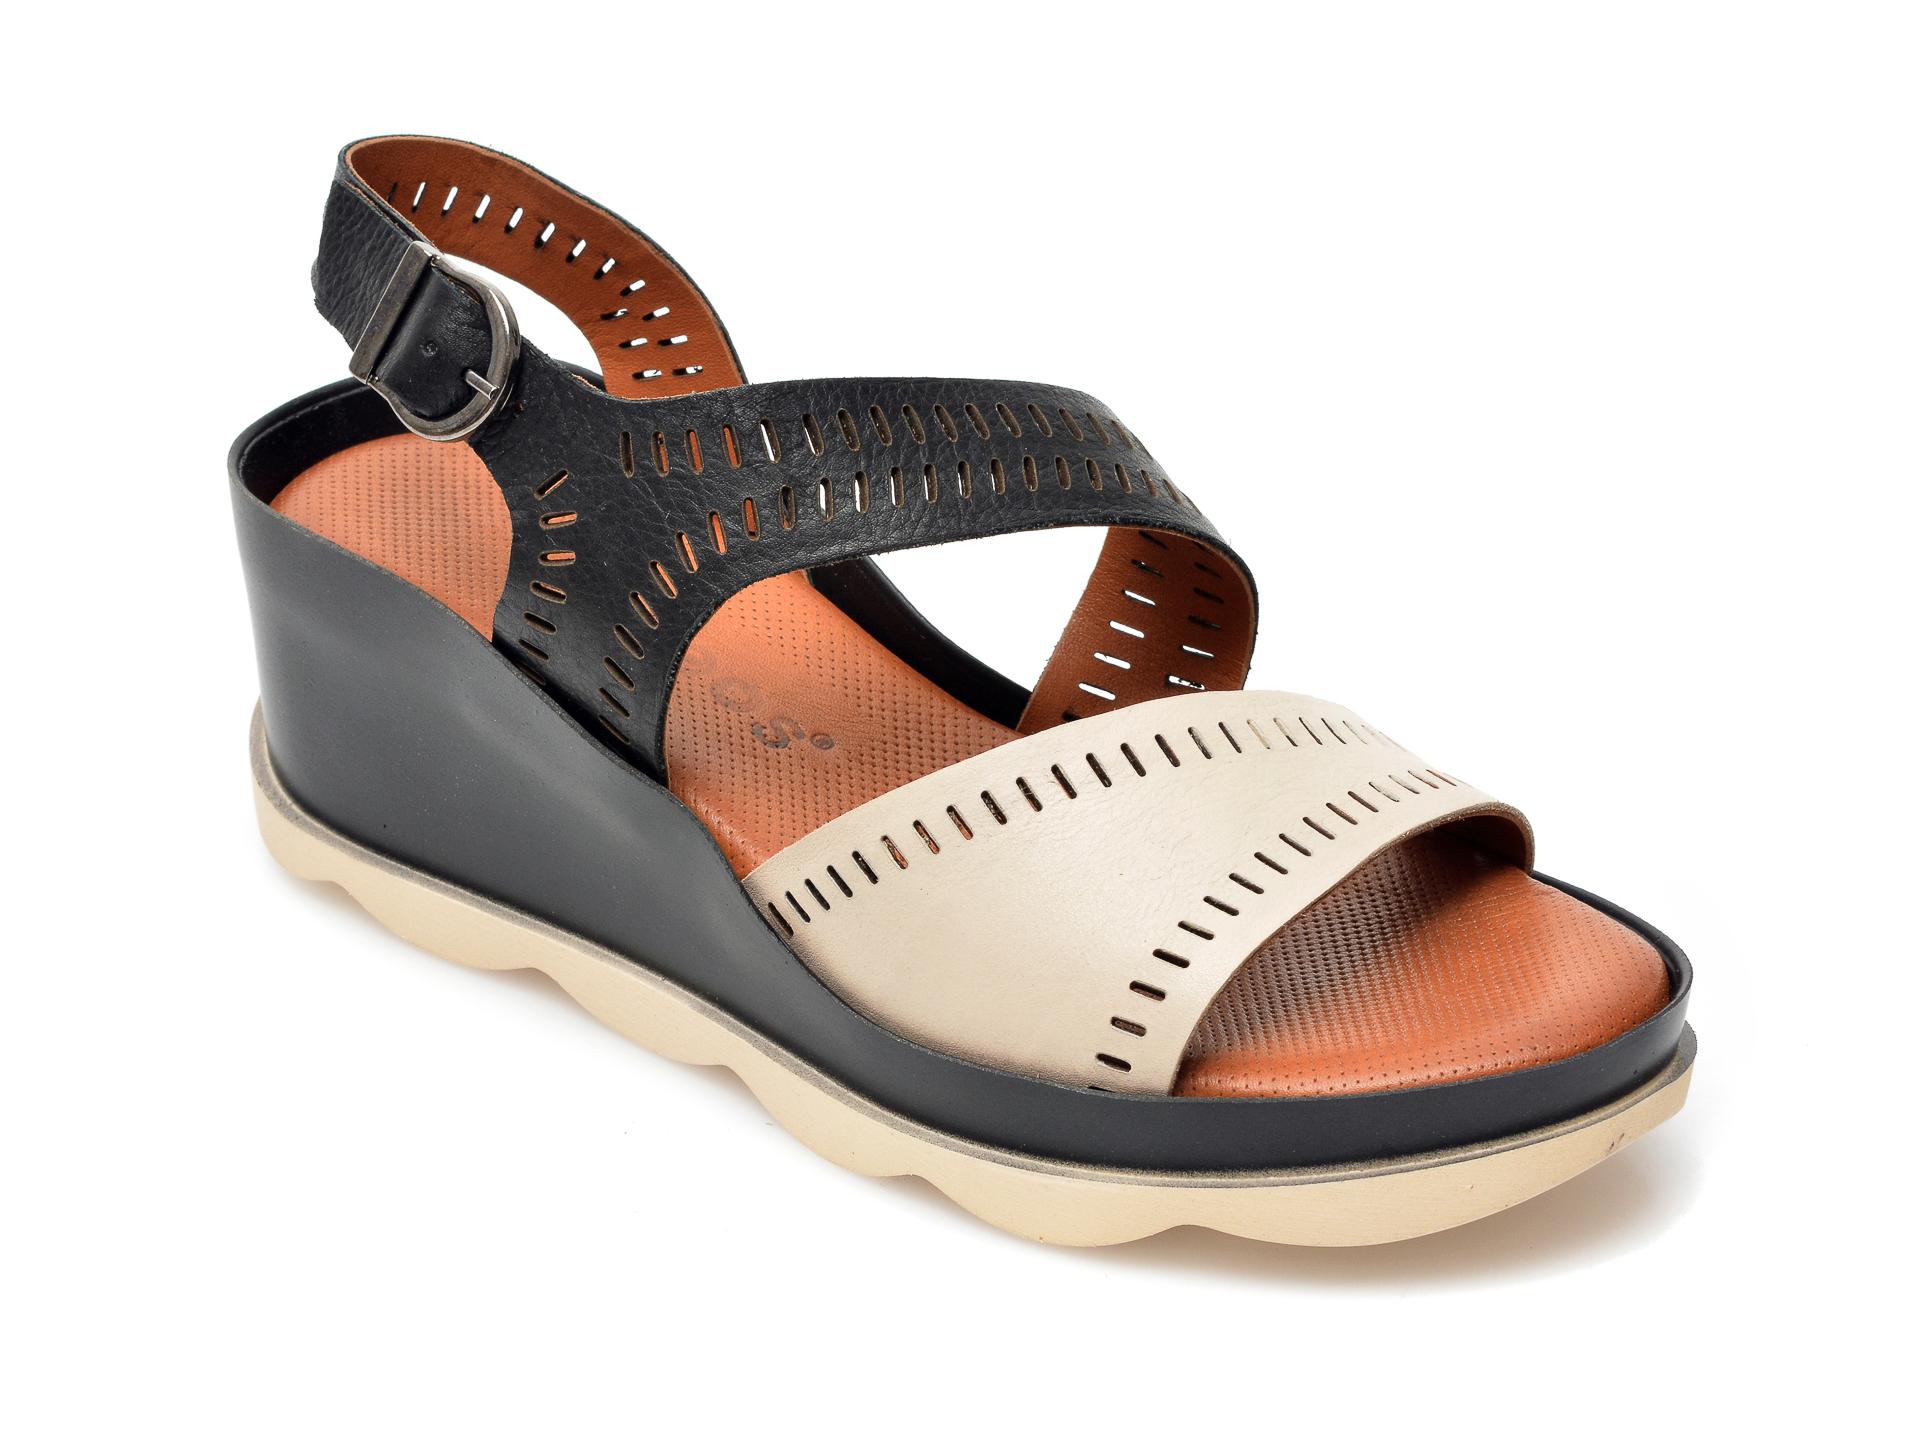 Sandale BABOOS bej, 504, din piele naturala imagine otter.ro